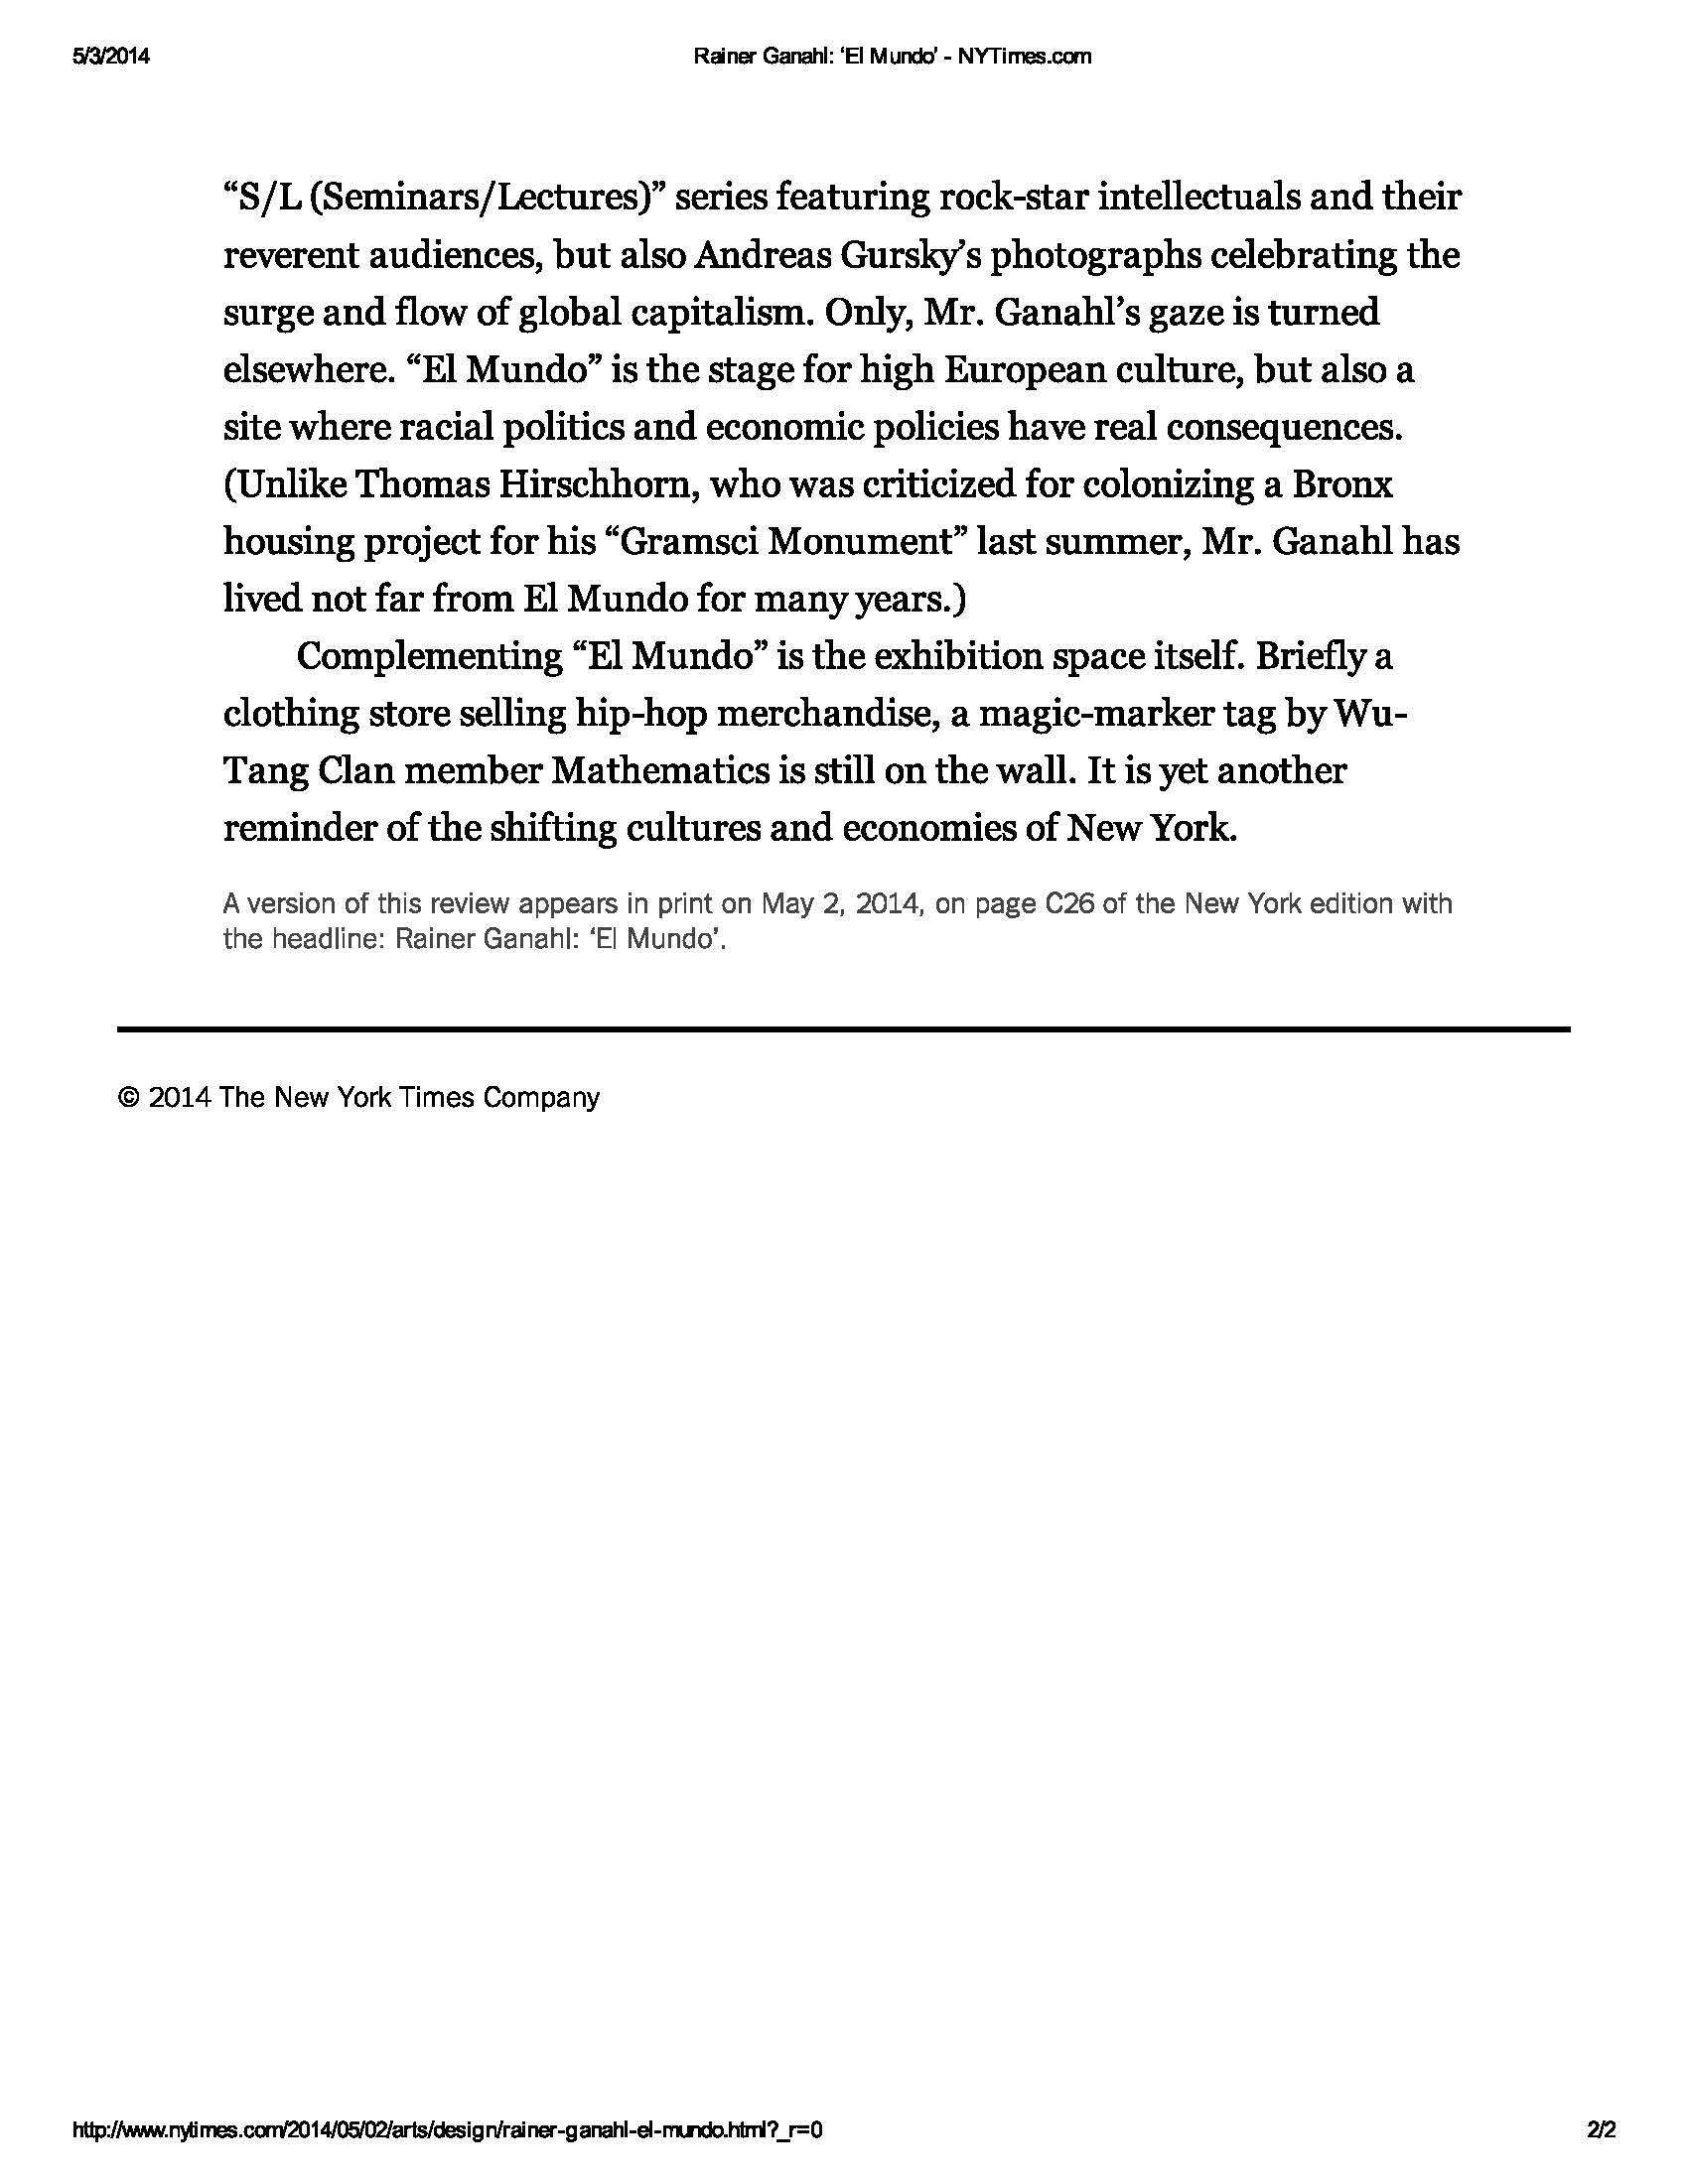 Rainer Ganahl_ 'El Mundo' - NYTimes_Page_2.jpg